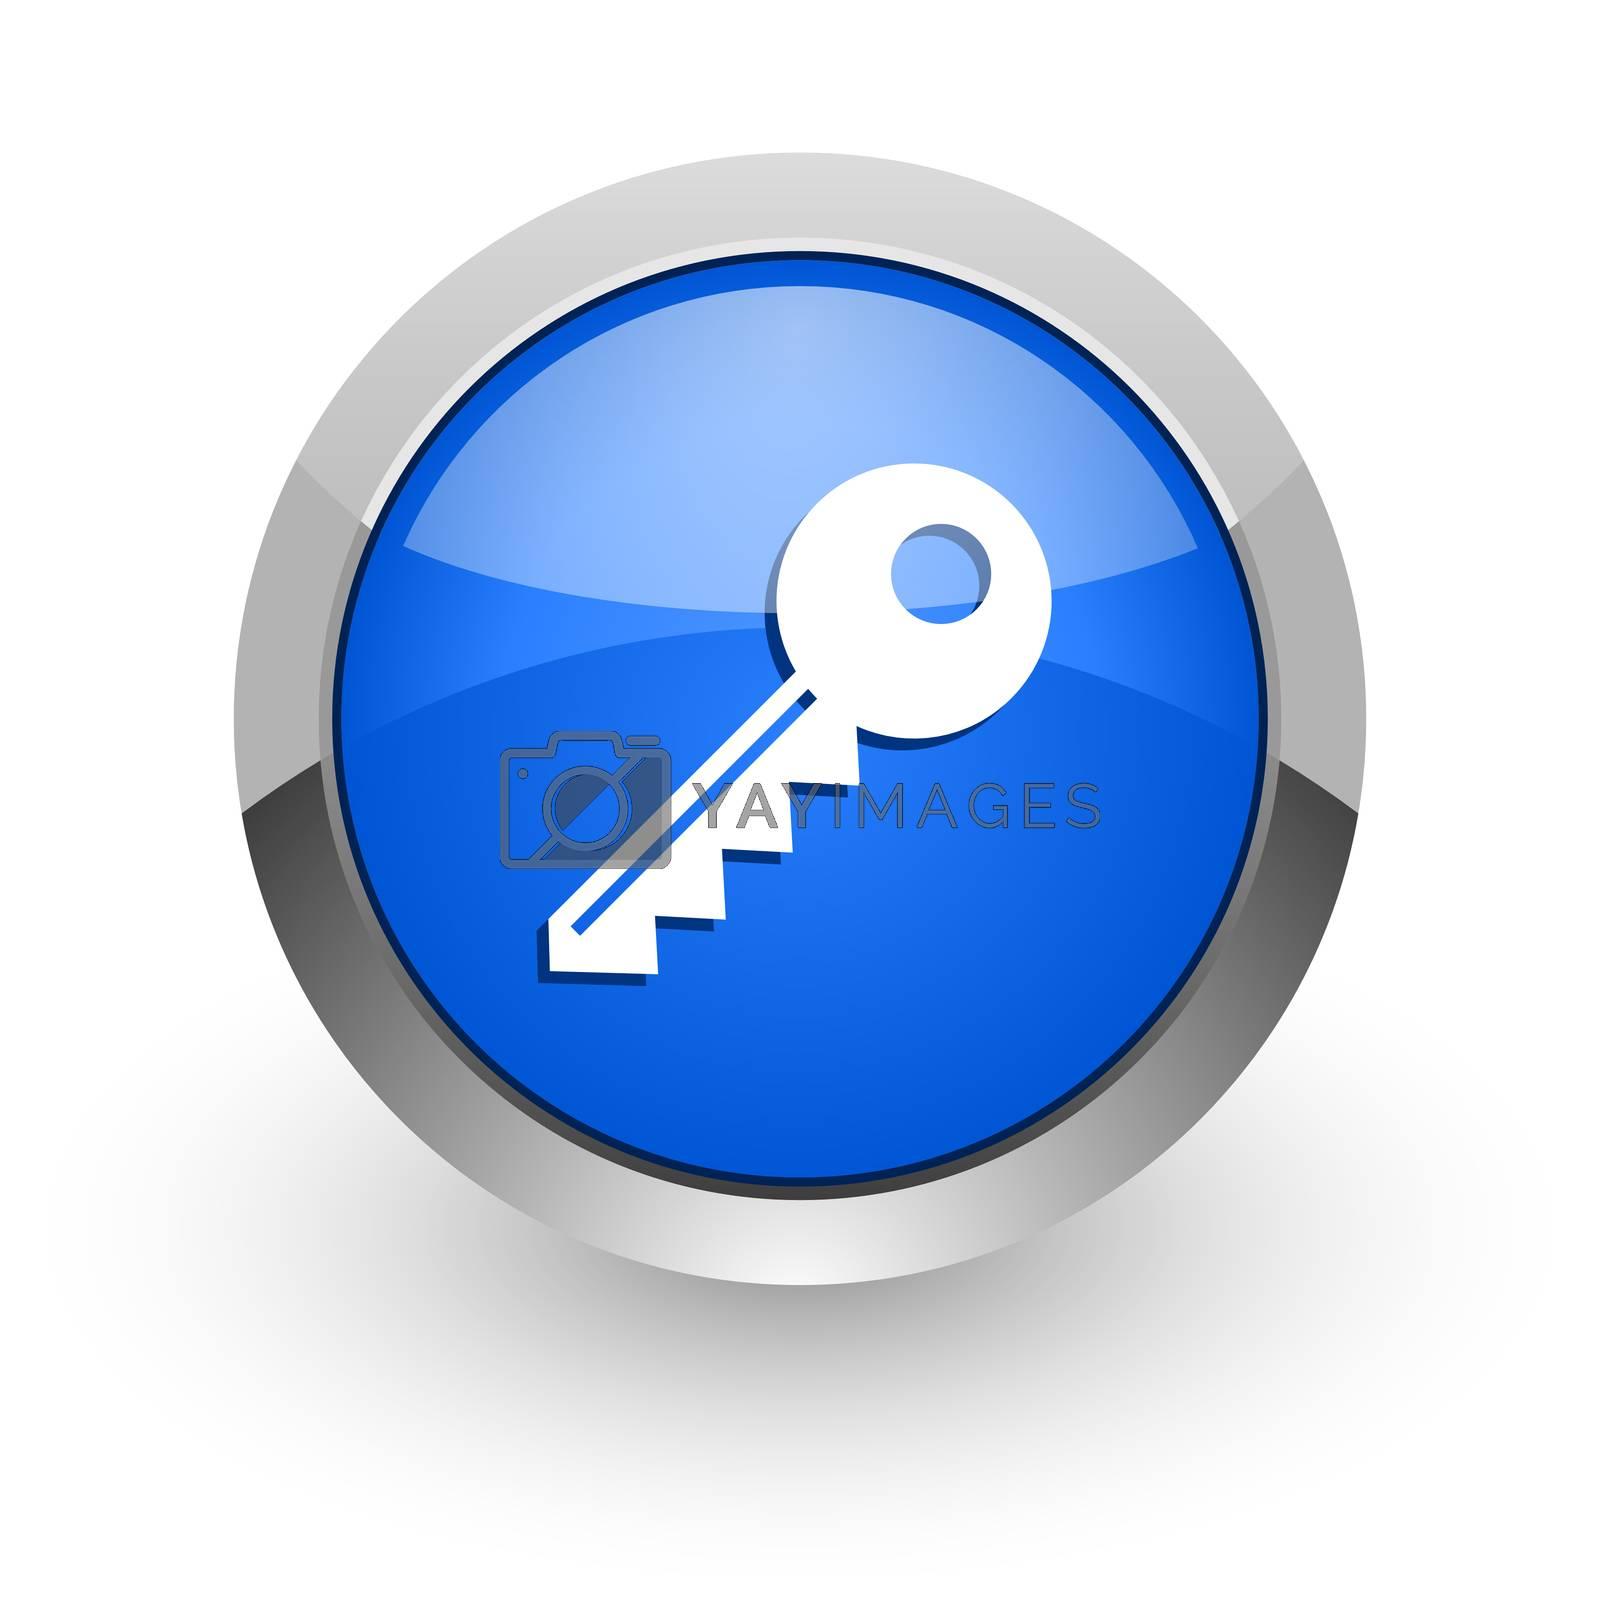 Royalty free image of key blue glossy web icon by alexwhite